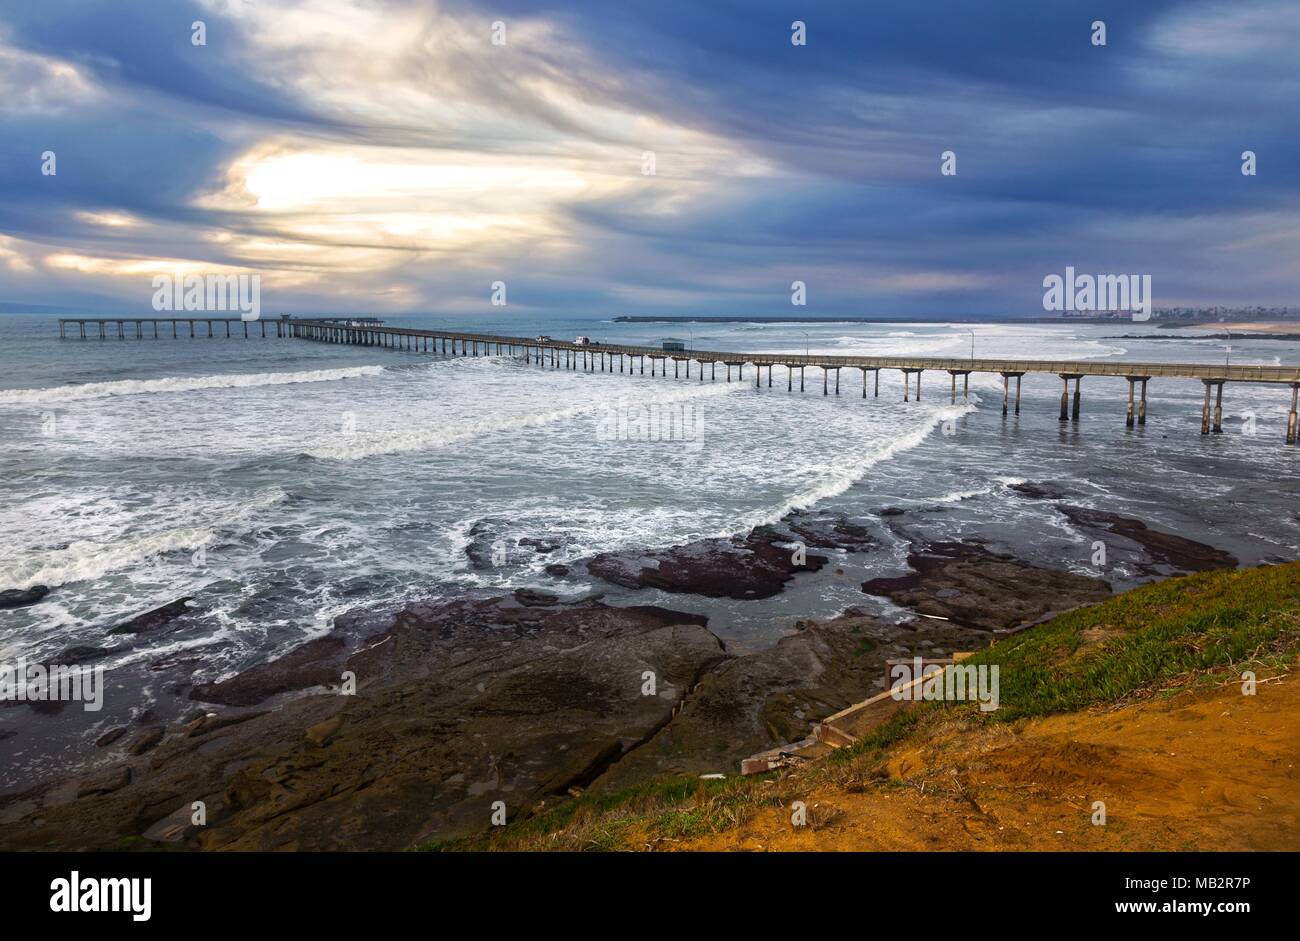 ocean-beach-pier-scenic-landscape-view-a